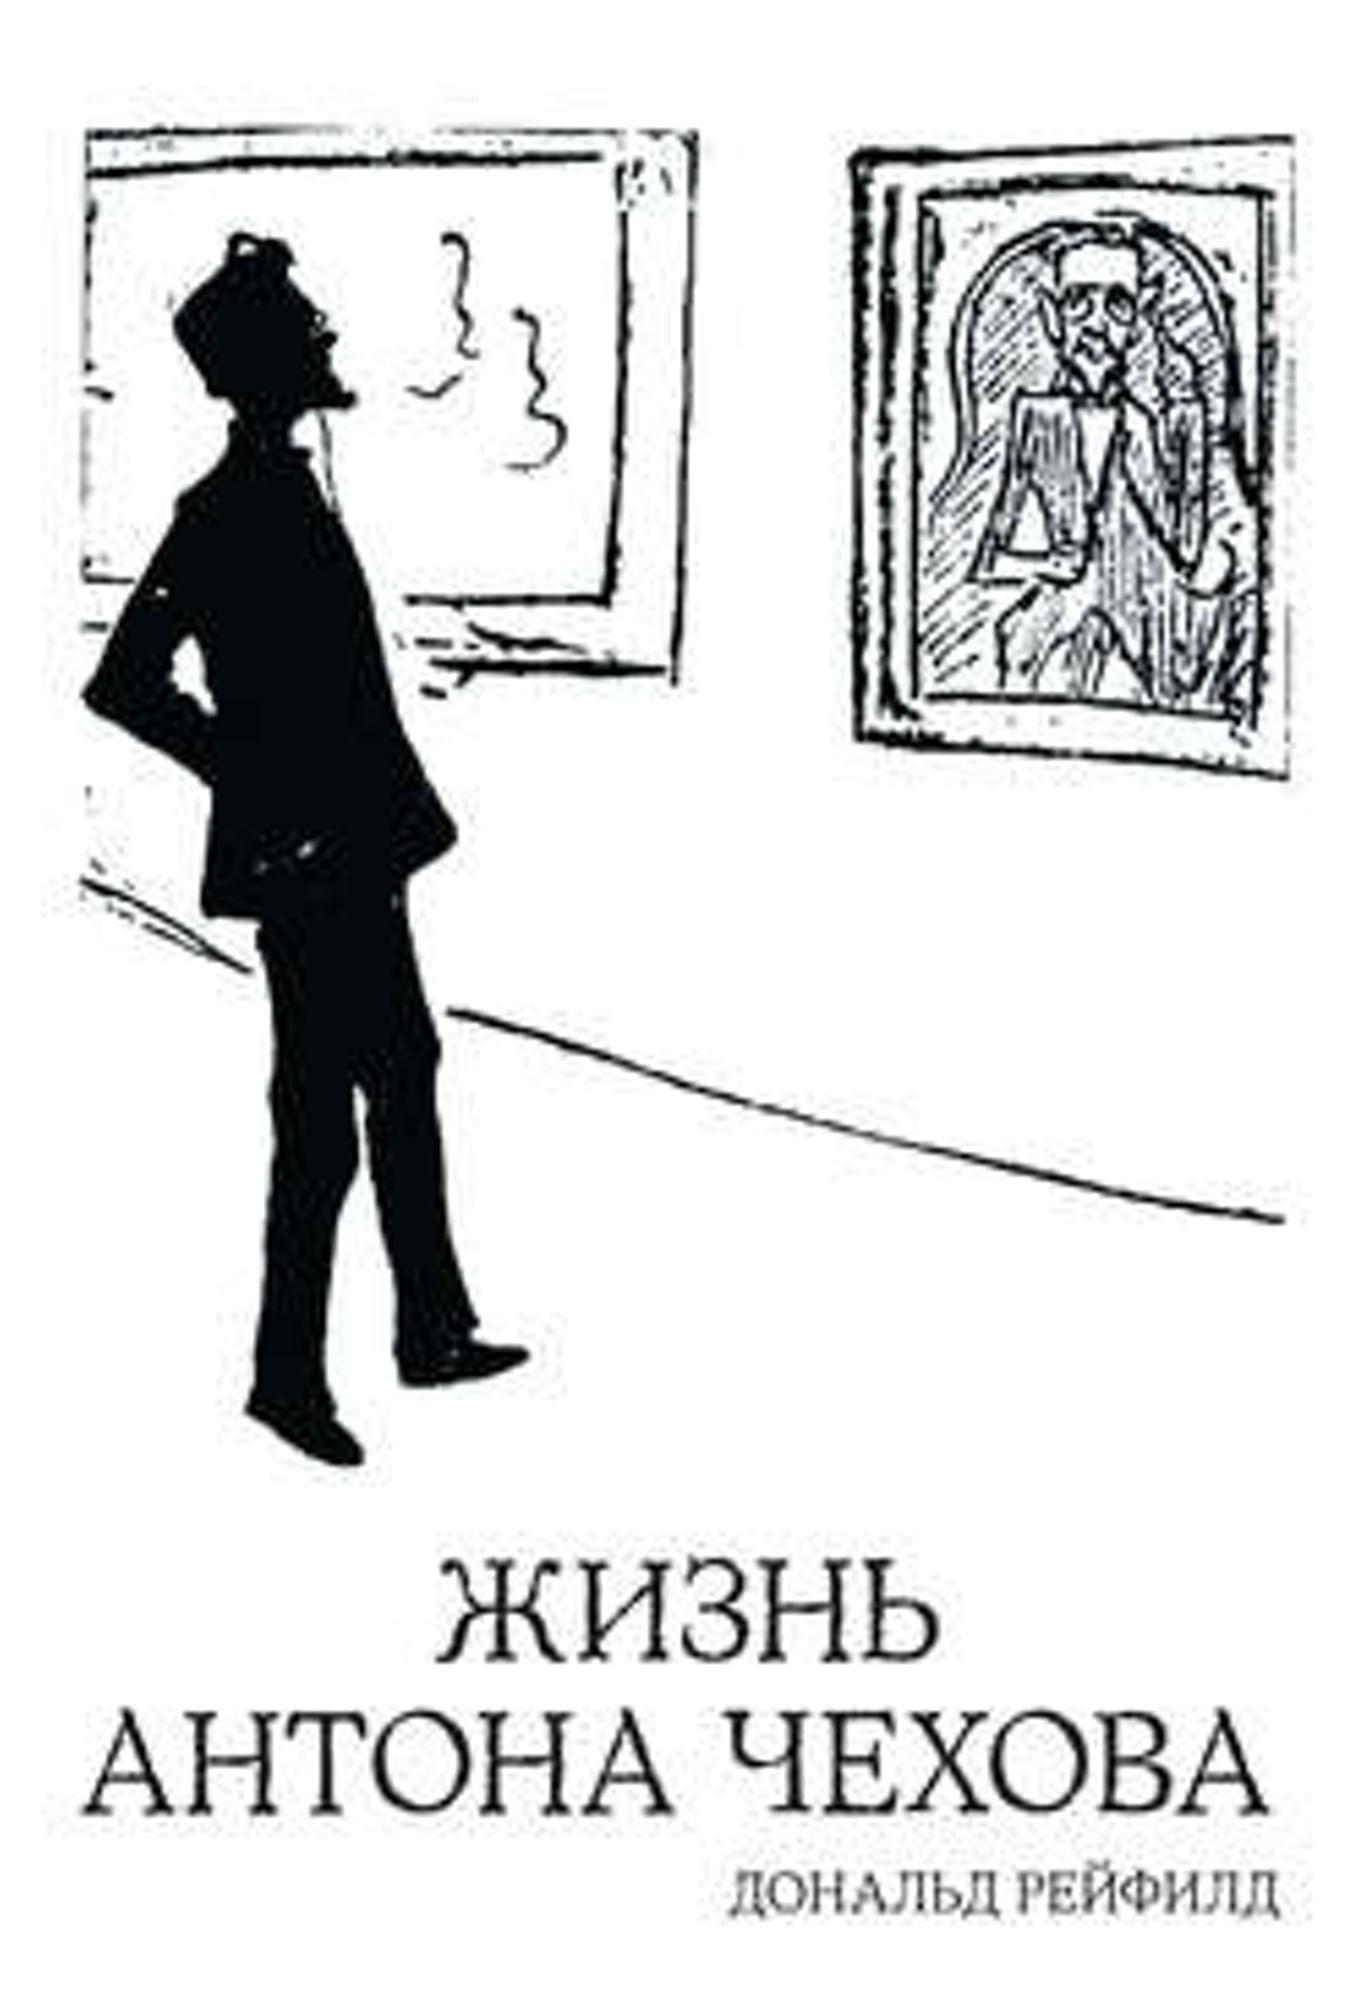 Берегите в себе человека: 10 книг об Антоне Чехове